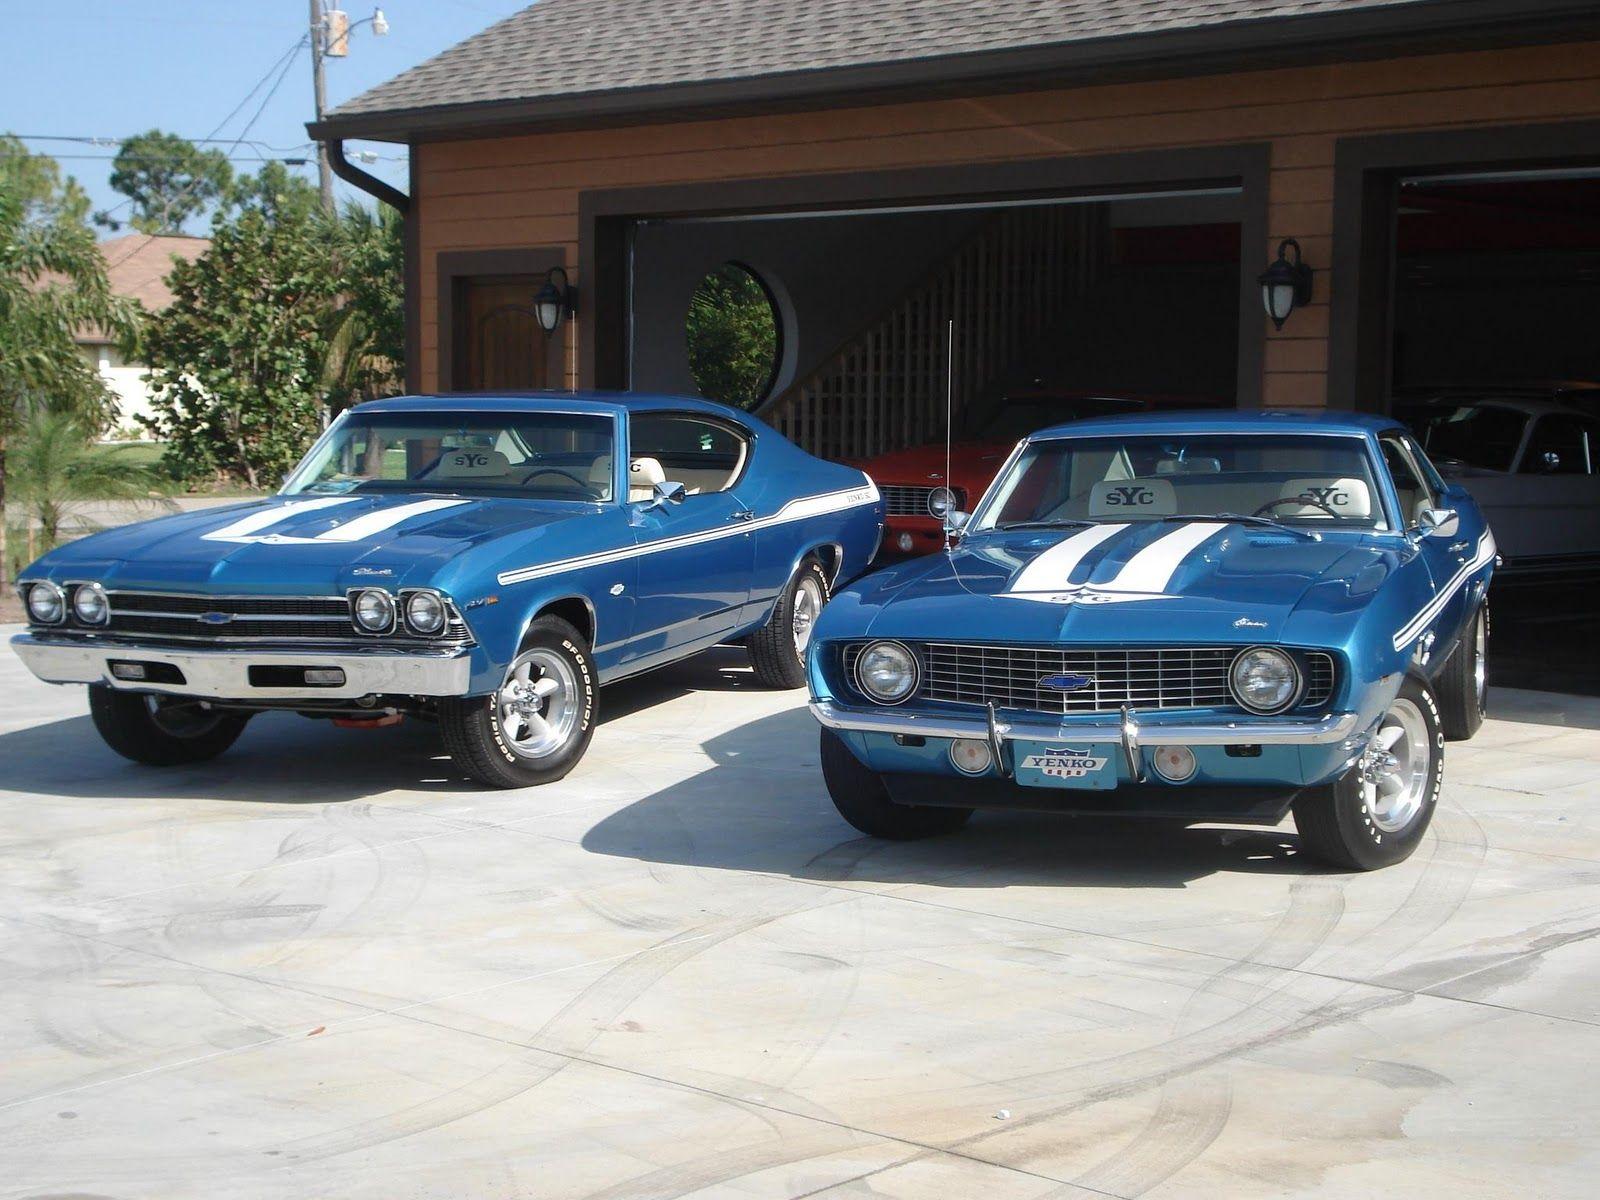 A driveway full of not fair. 69 chevelle 69 camaro. Hopefully not ...